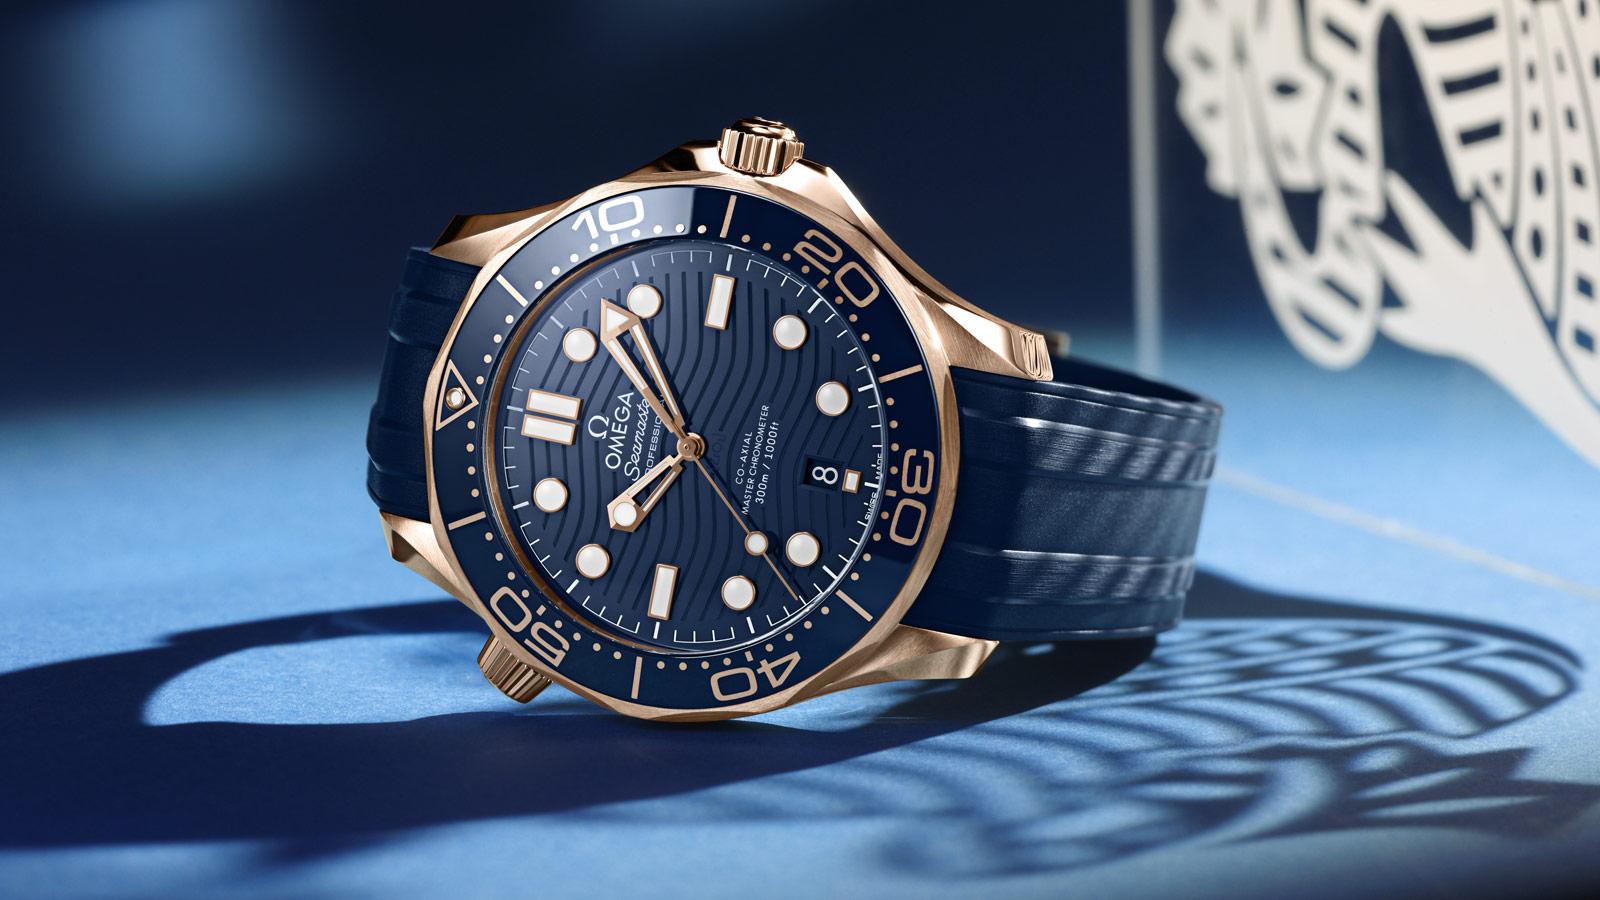 Seamaster 300米潜水表 300米潜水表 欧米茄同轴•至臻天文台表42毫米 腕表 - 210.62.42.20.03.001